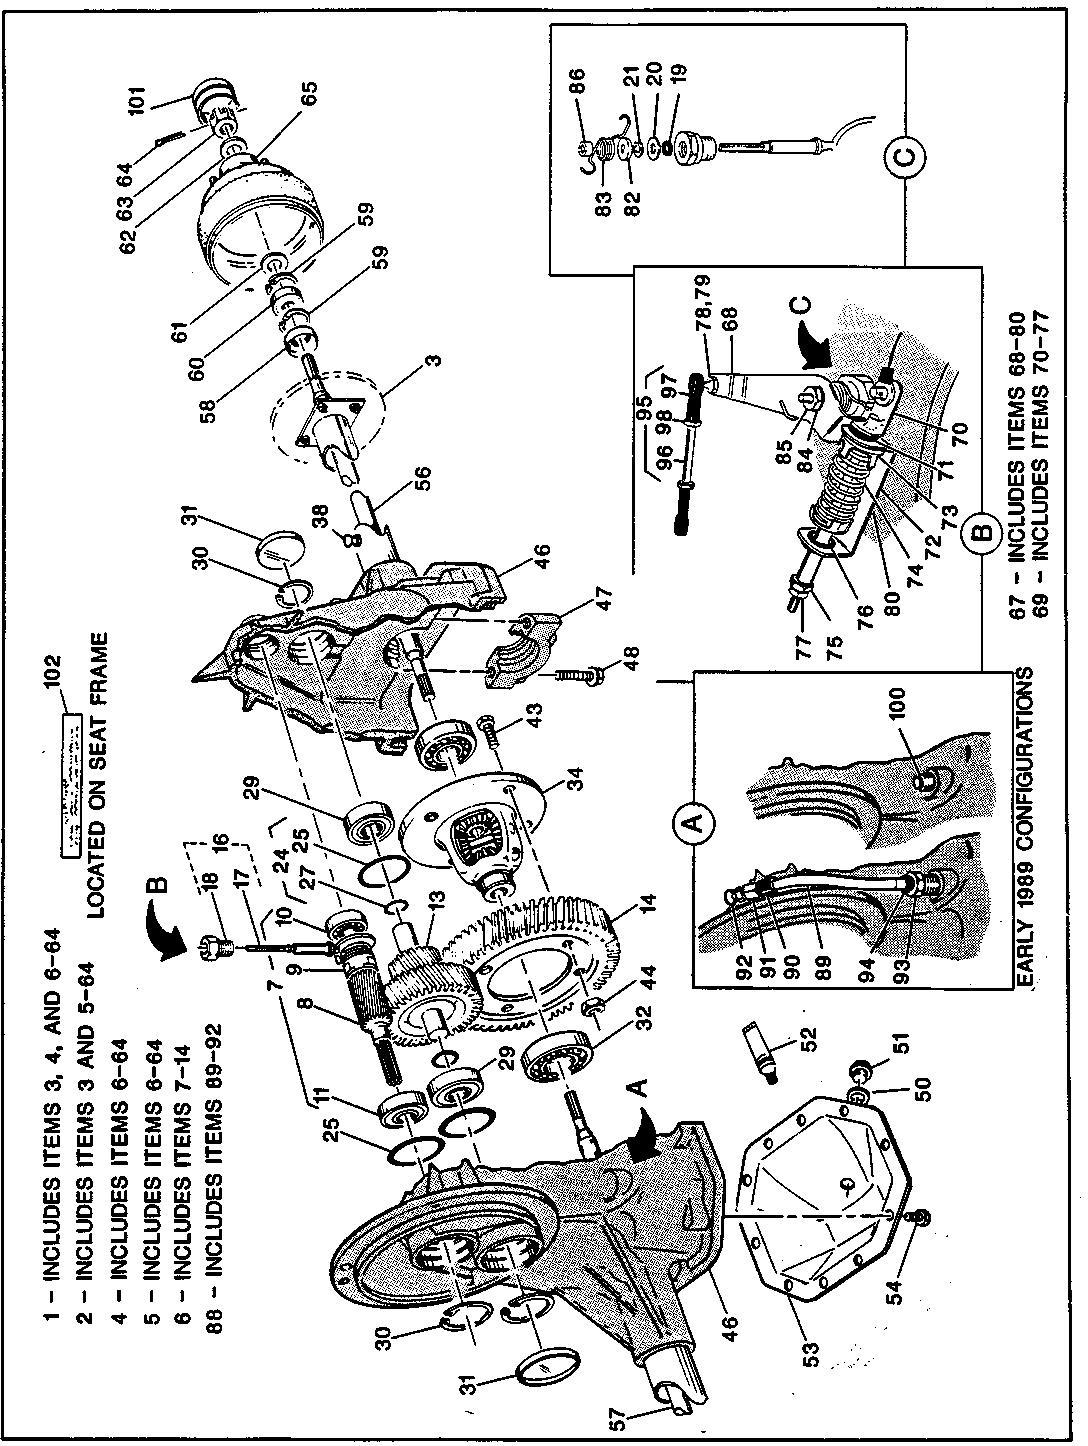 Gx 444